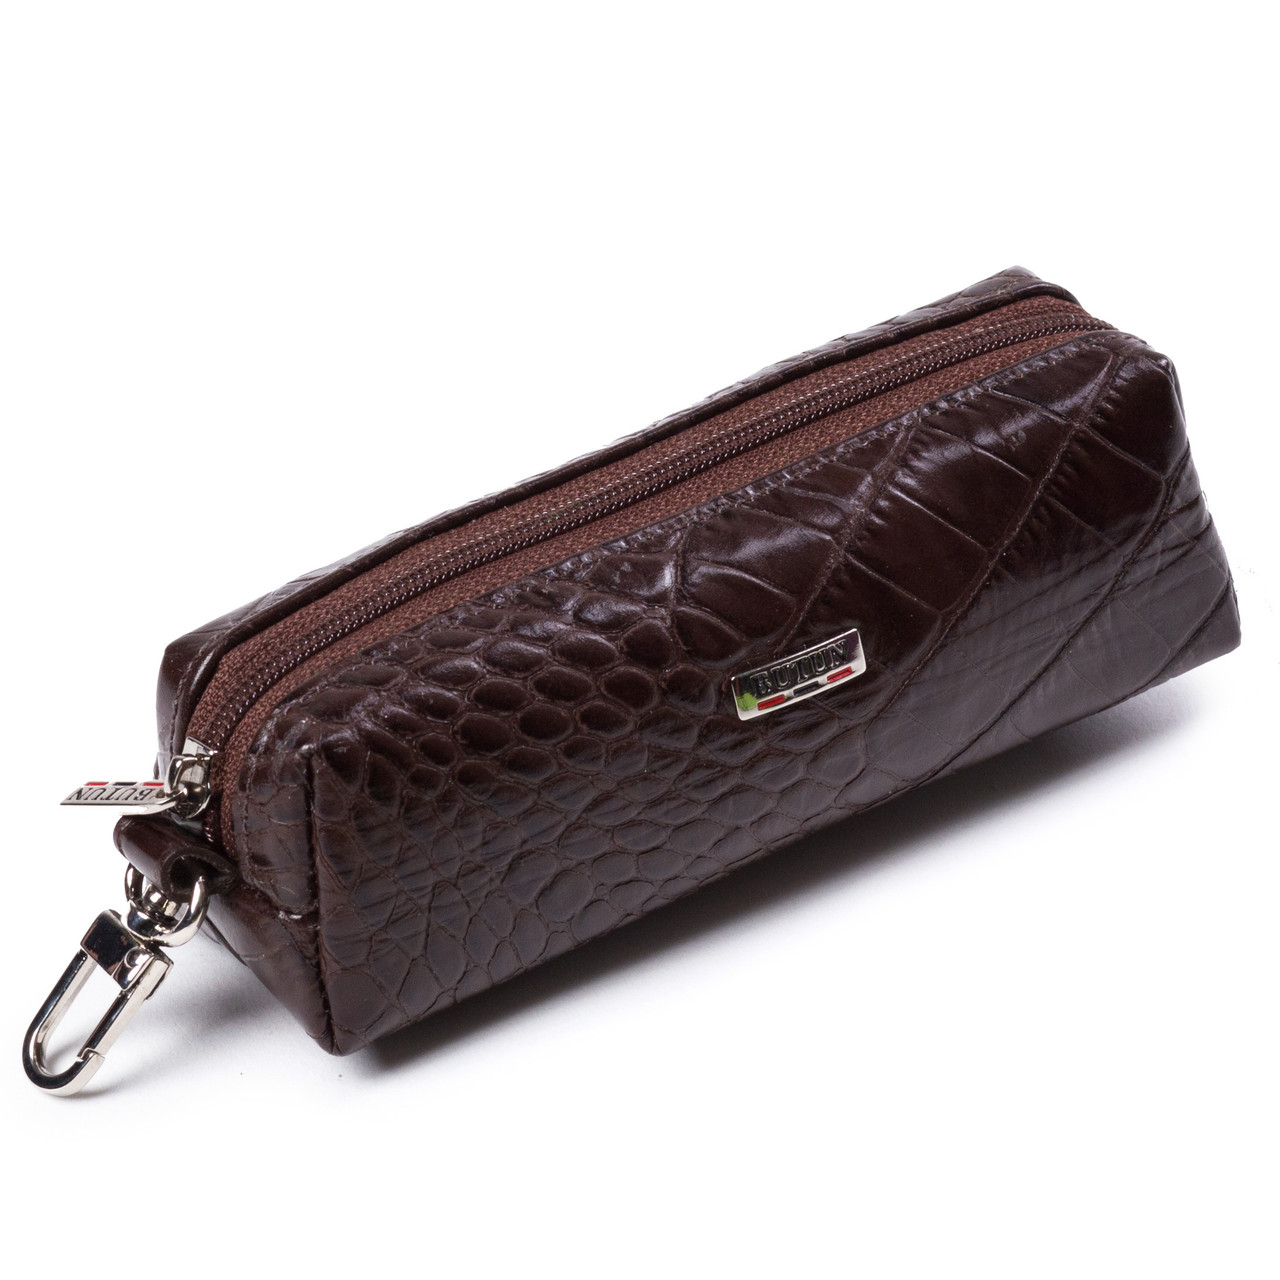 Ключница кожаная коричневая Butun 784-002-004